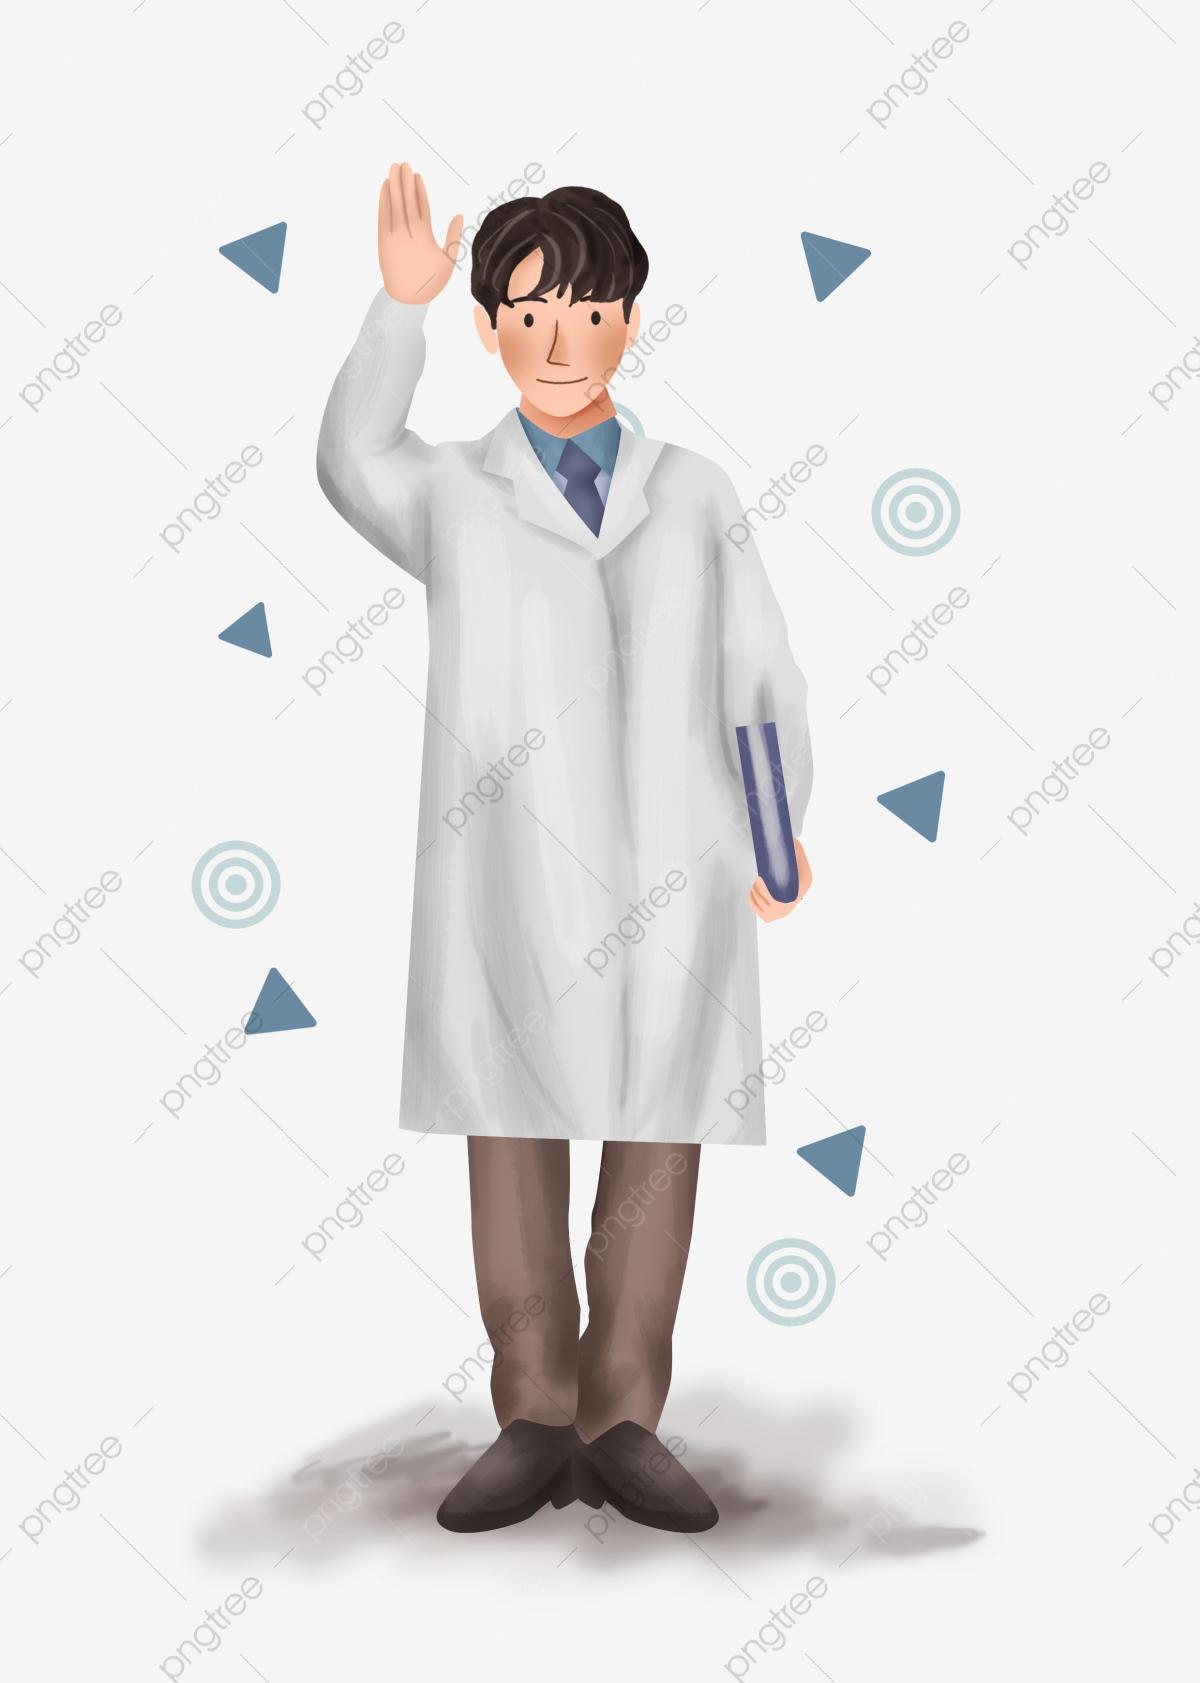 Disease clipart doctor. Medical hospital doctors male